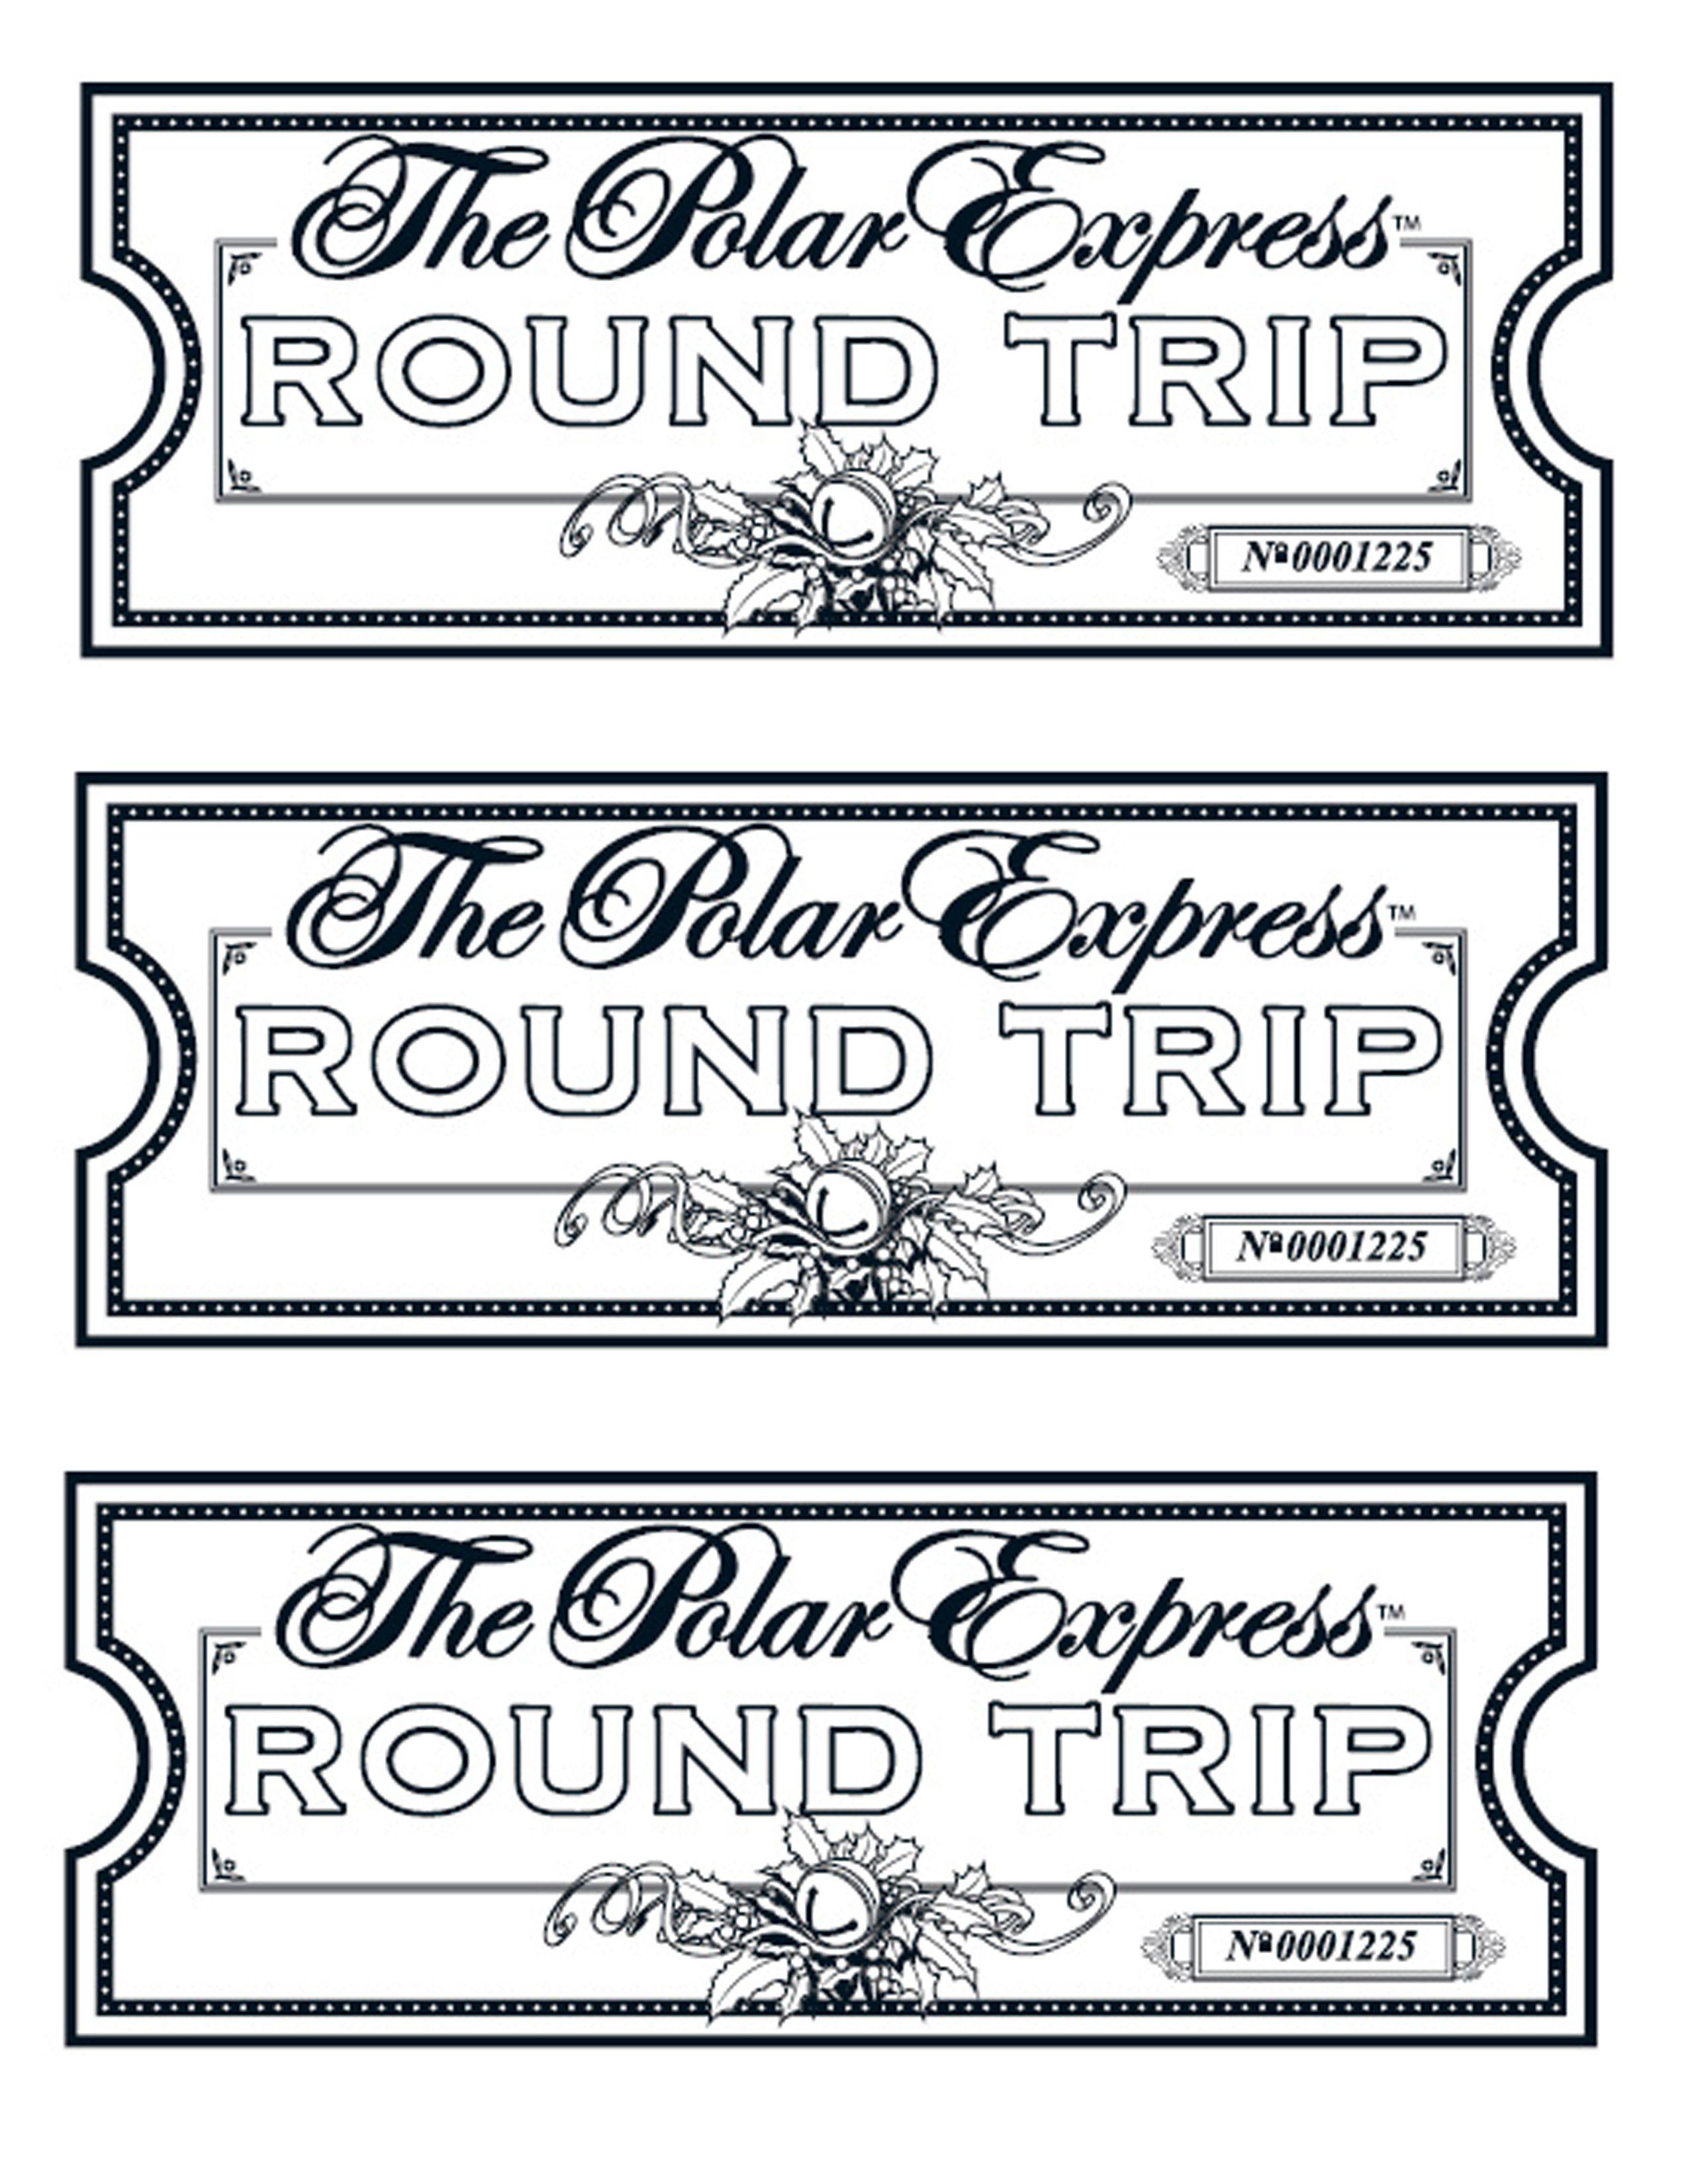 Polar express golden ticket clipart jpg black and white stock My take on the Polar Express tickets. We printed them on ... jpg black and white stock